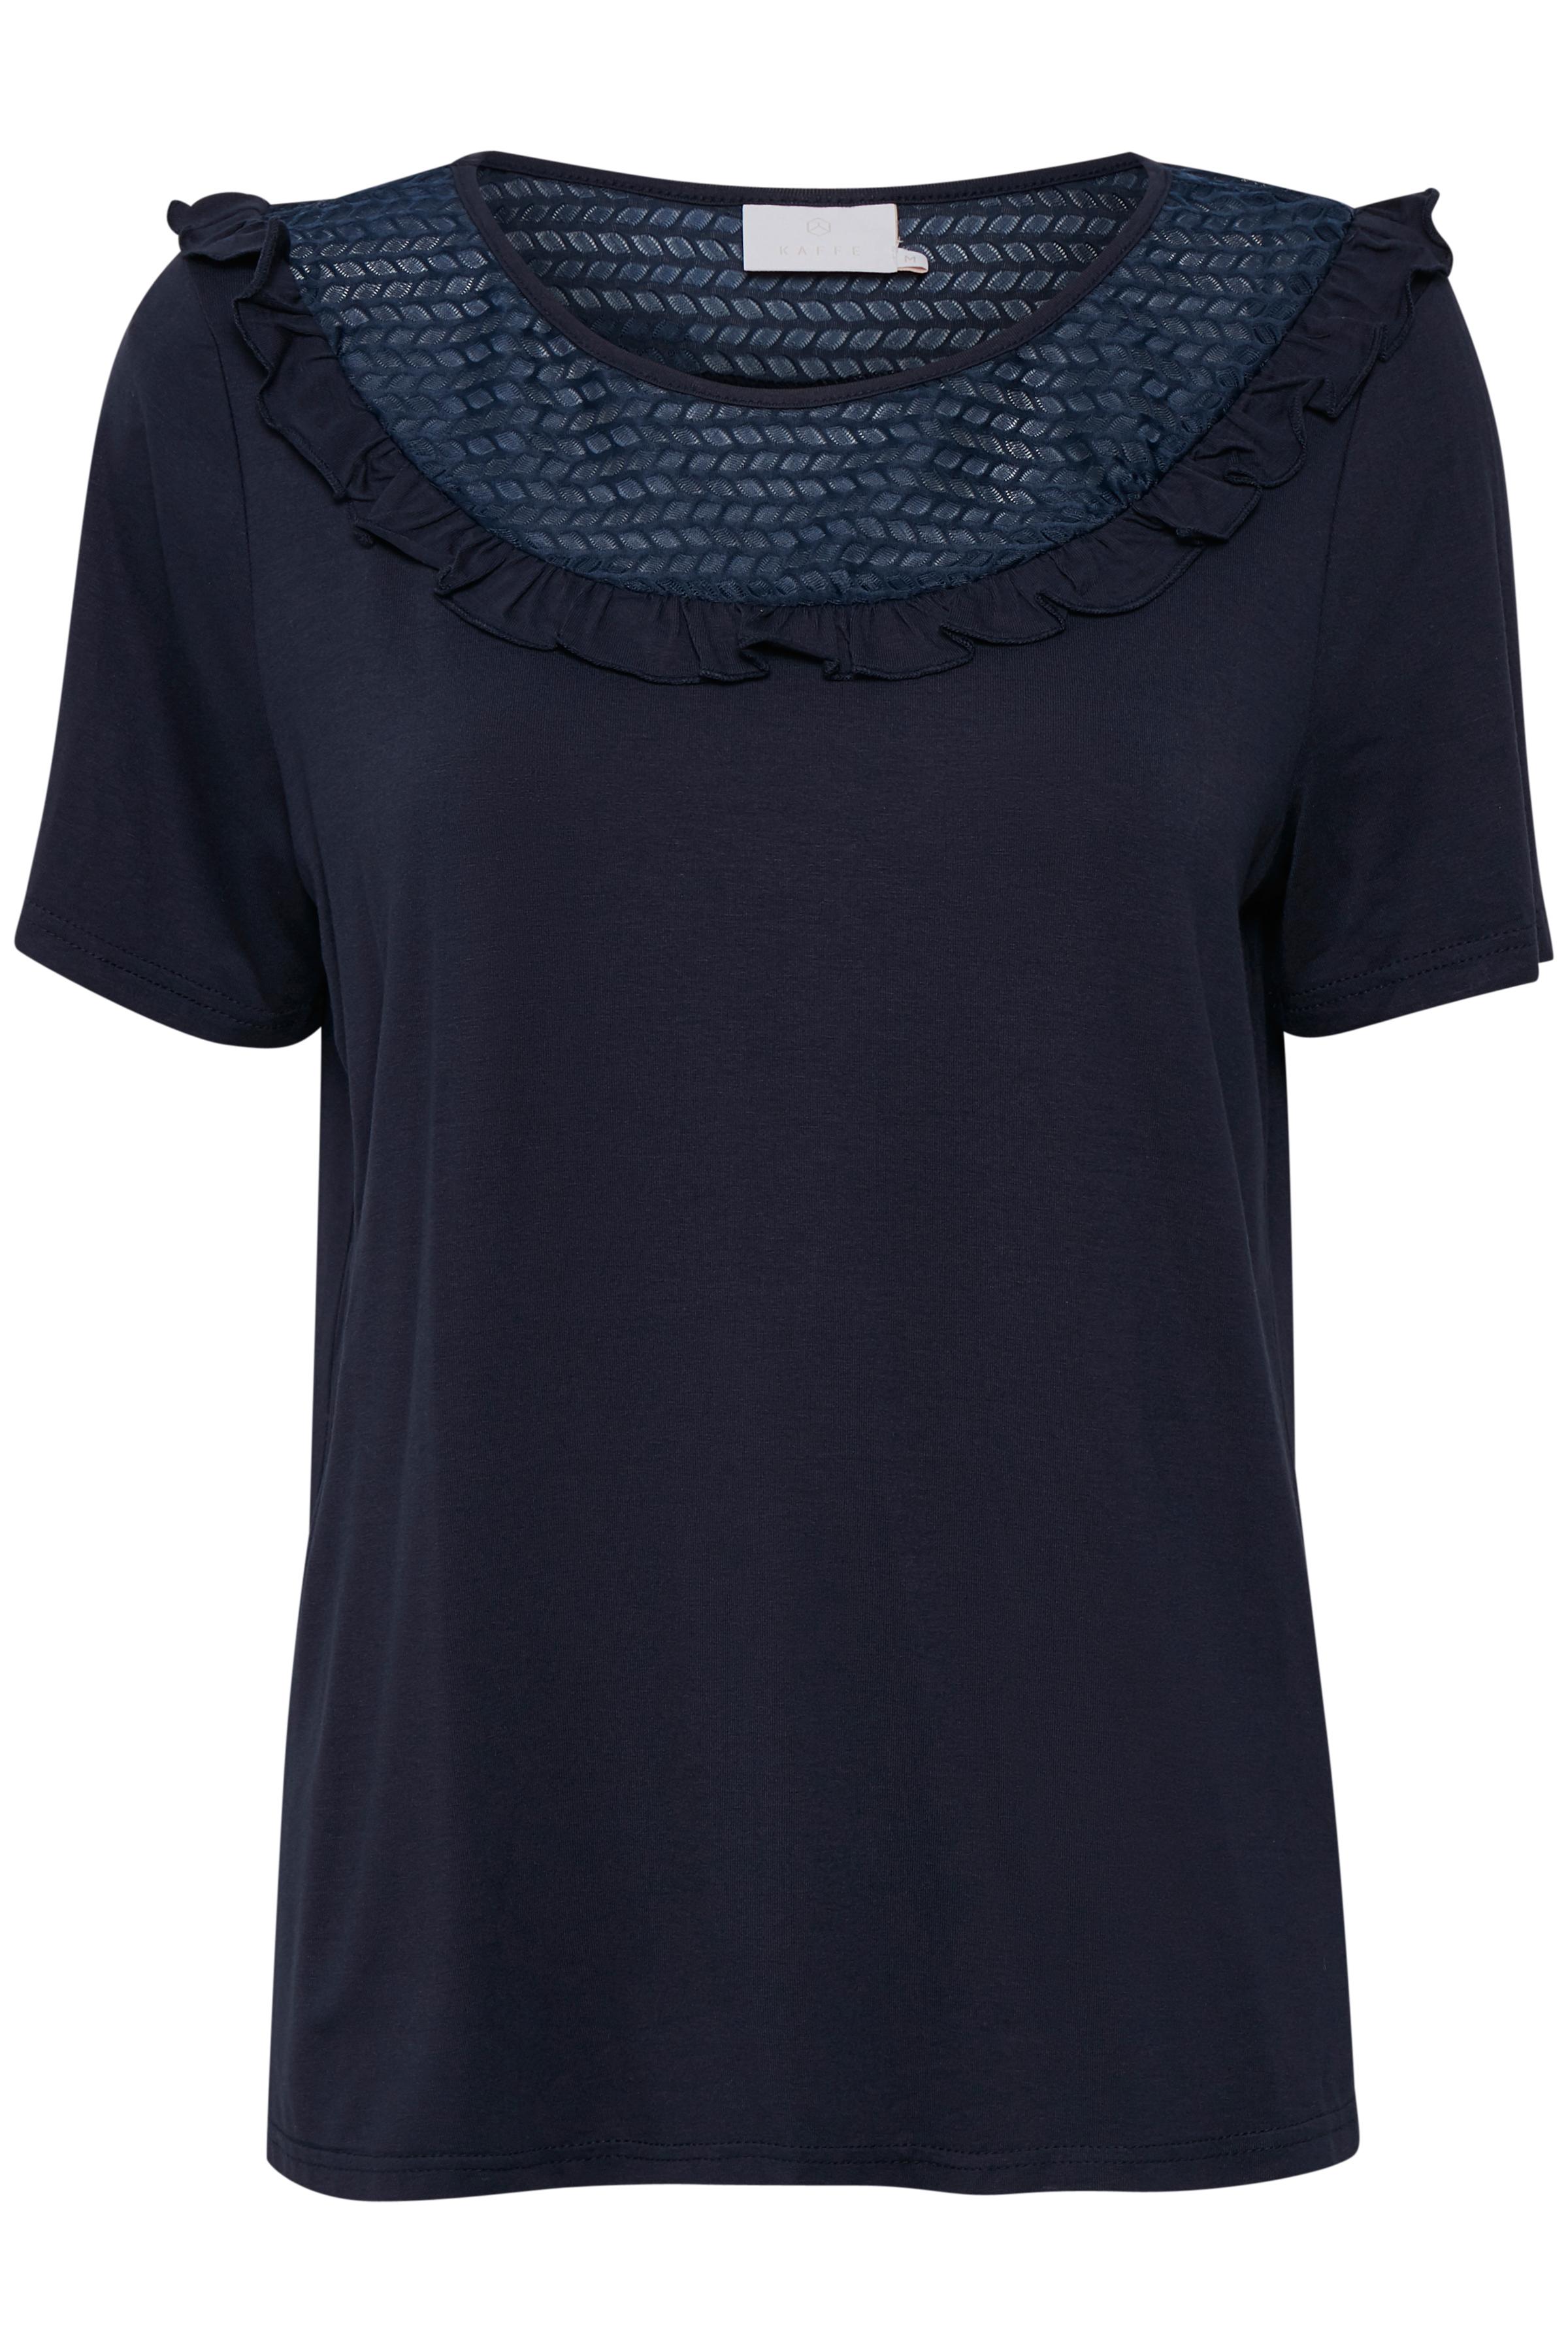 Kaffe Dame T-shirt korte mouw - Marineblauw